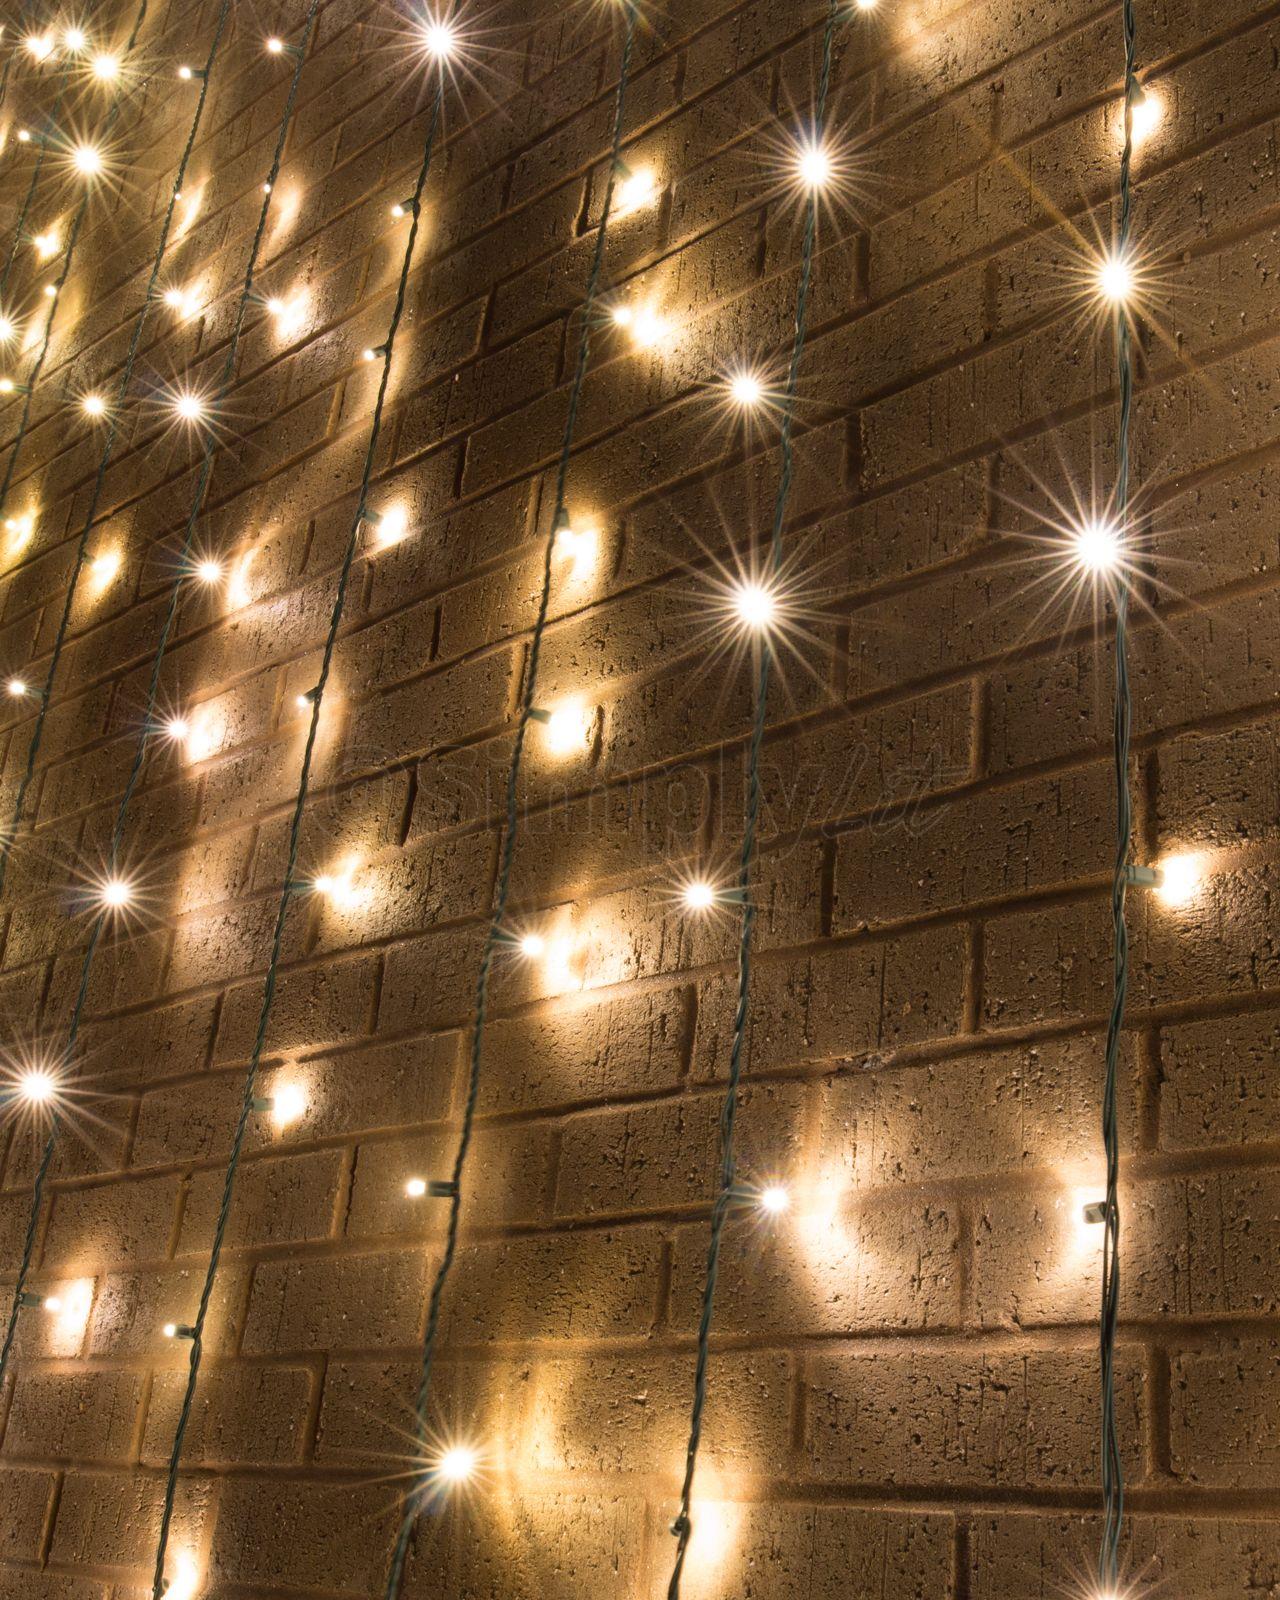 Lights Overlaying A Brick Wall